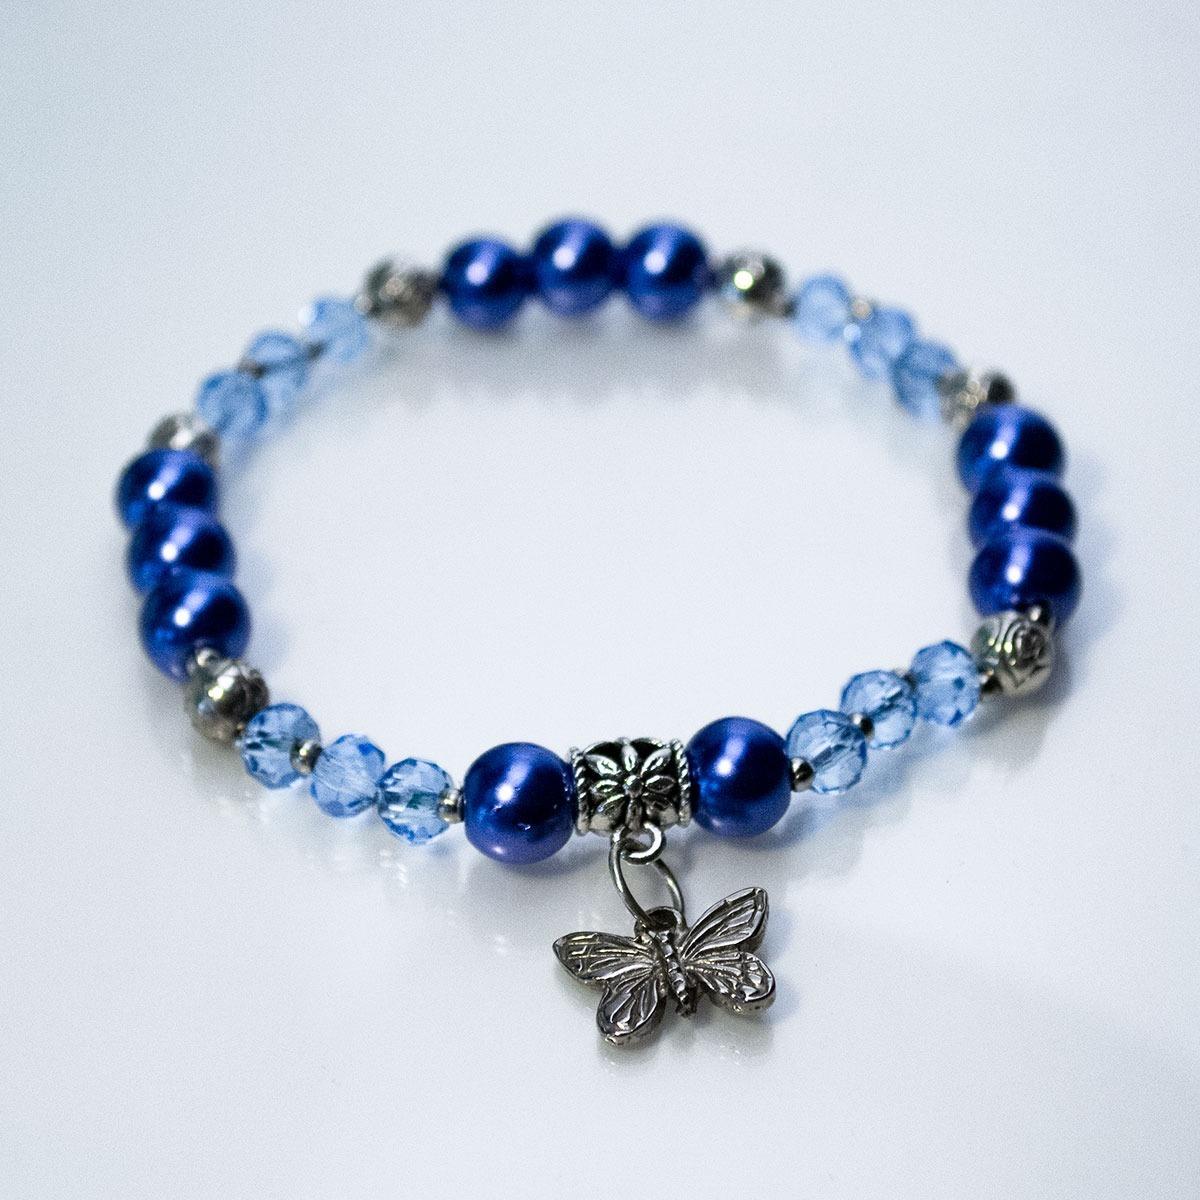 c1cb7e9b0b89 Pulsera Perlas Checas Azul Y Cristal Checo Facetado